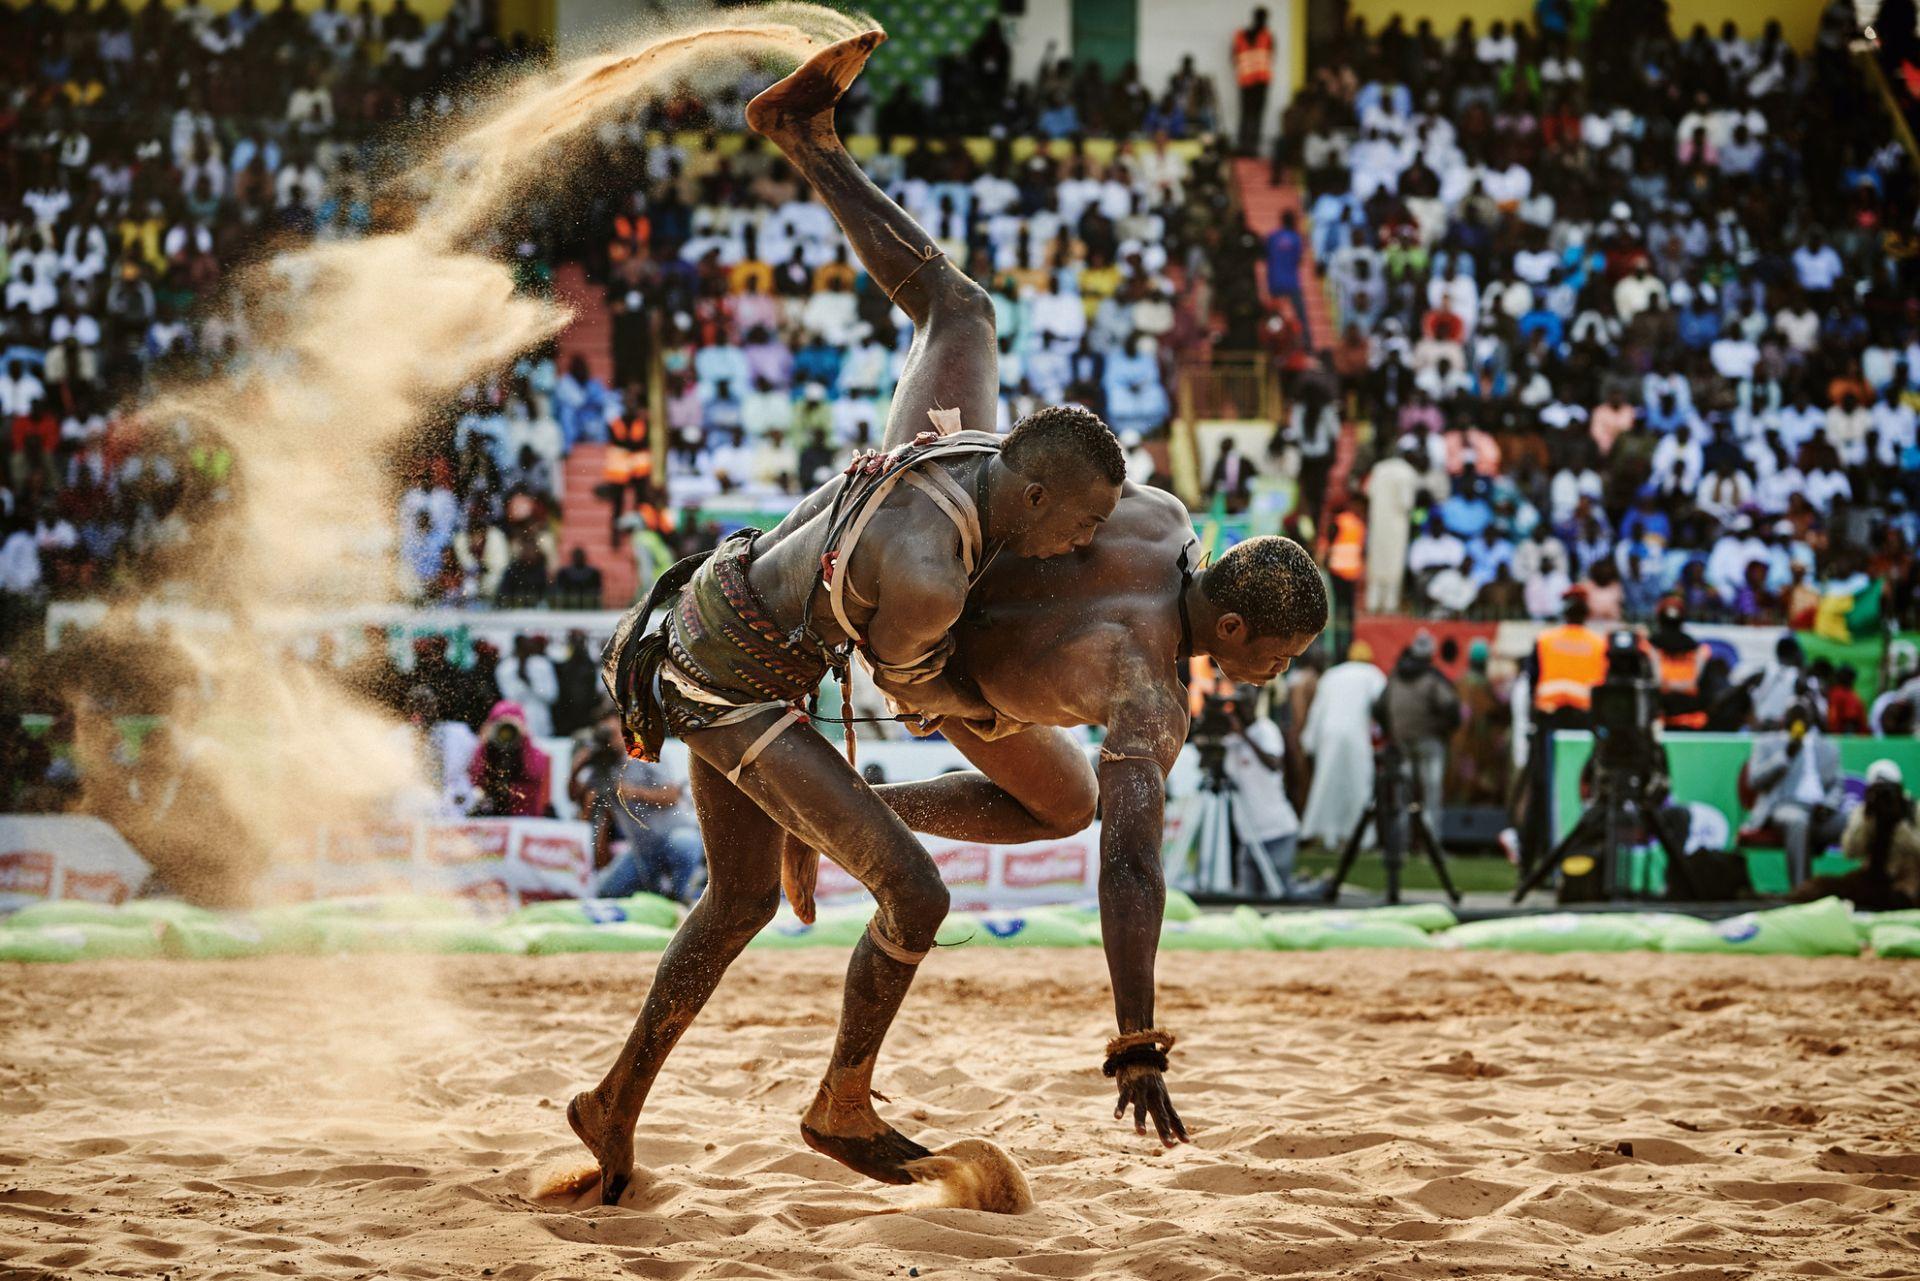 The Gris Gris Wrestlers of Senegal - 7